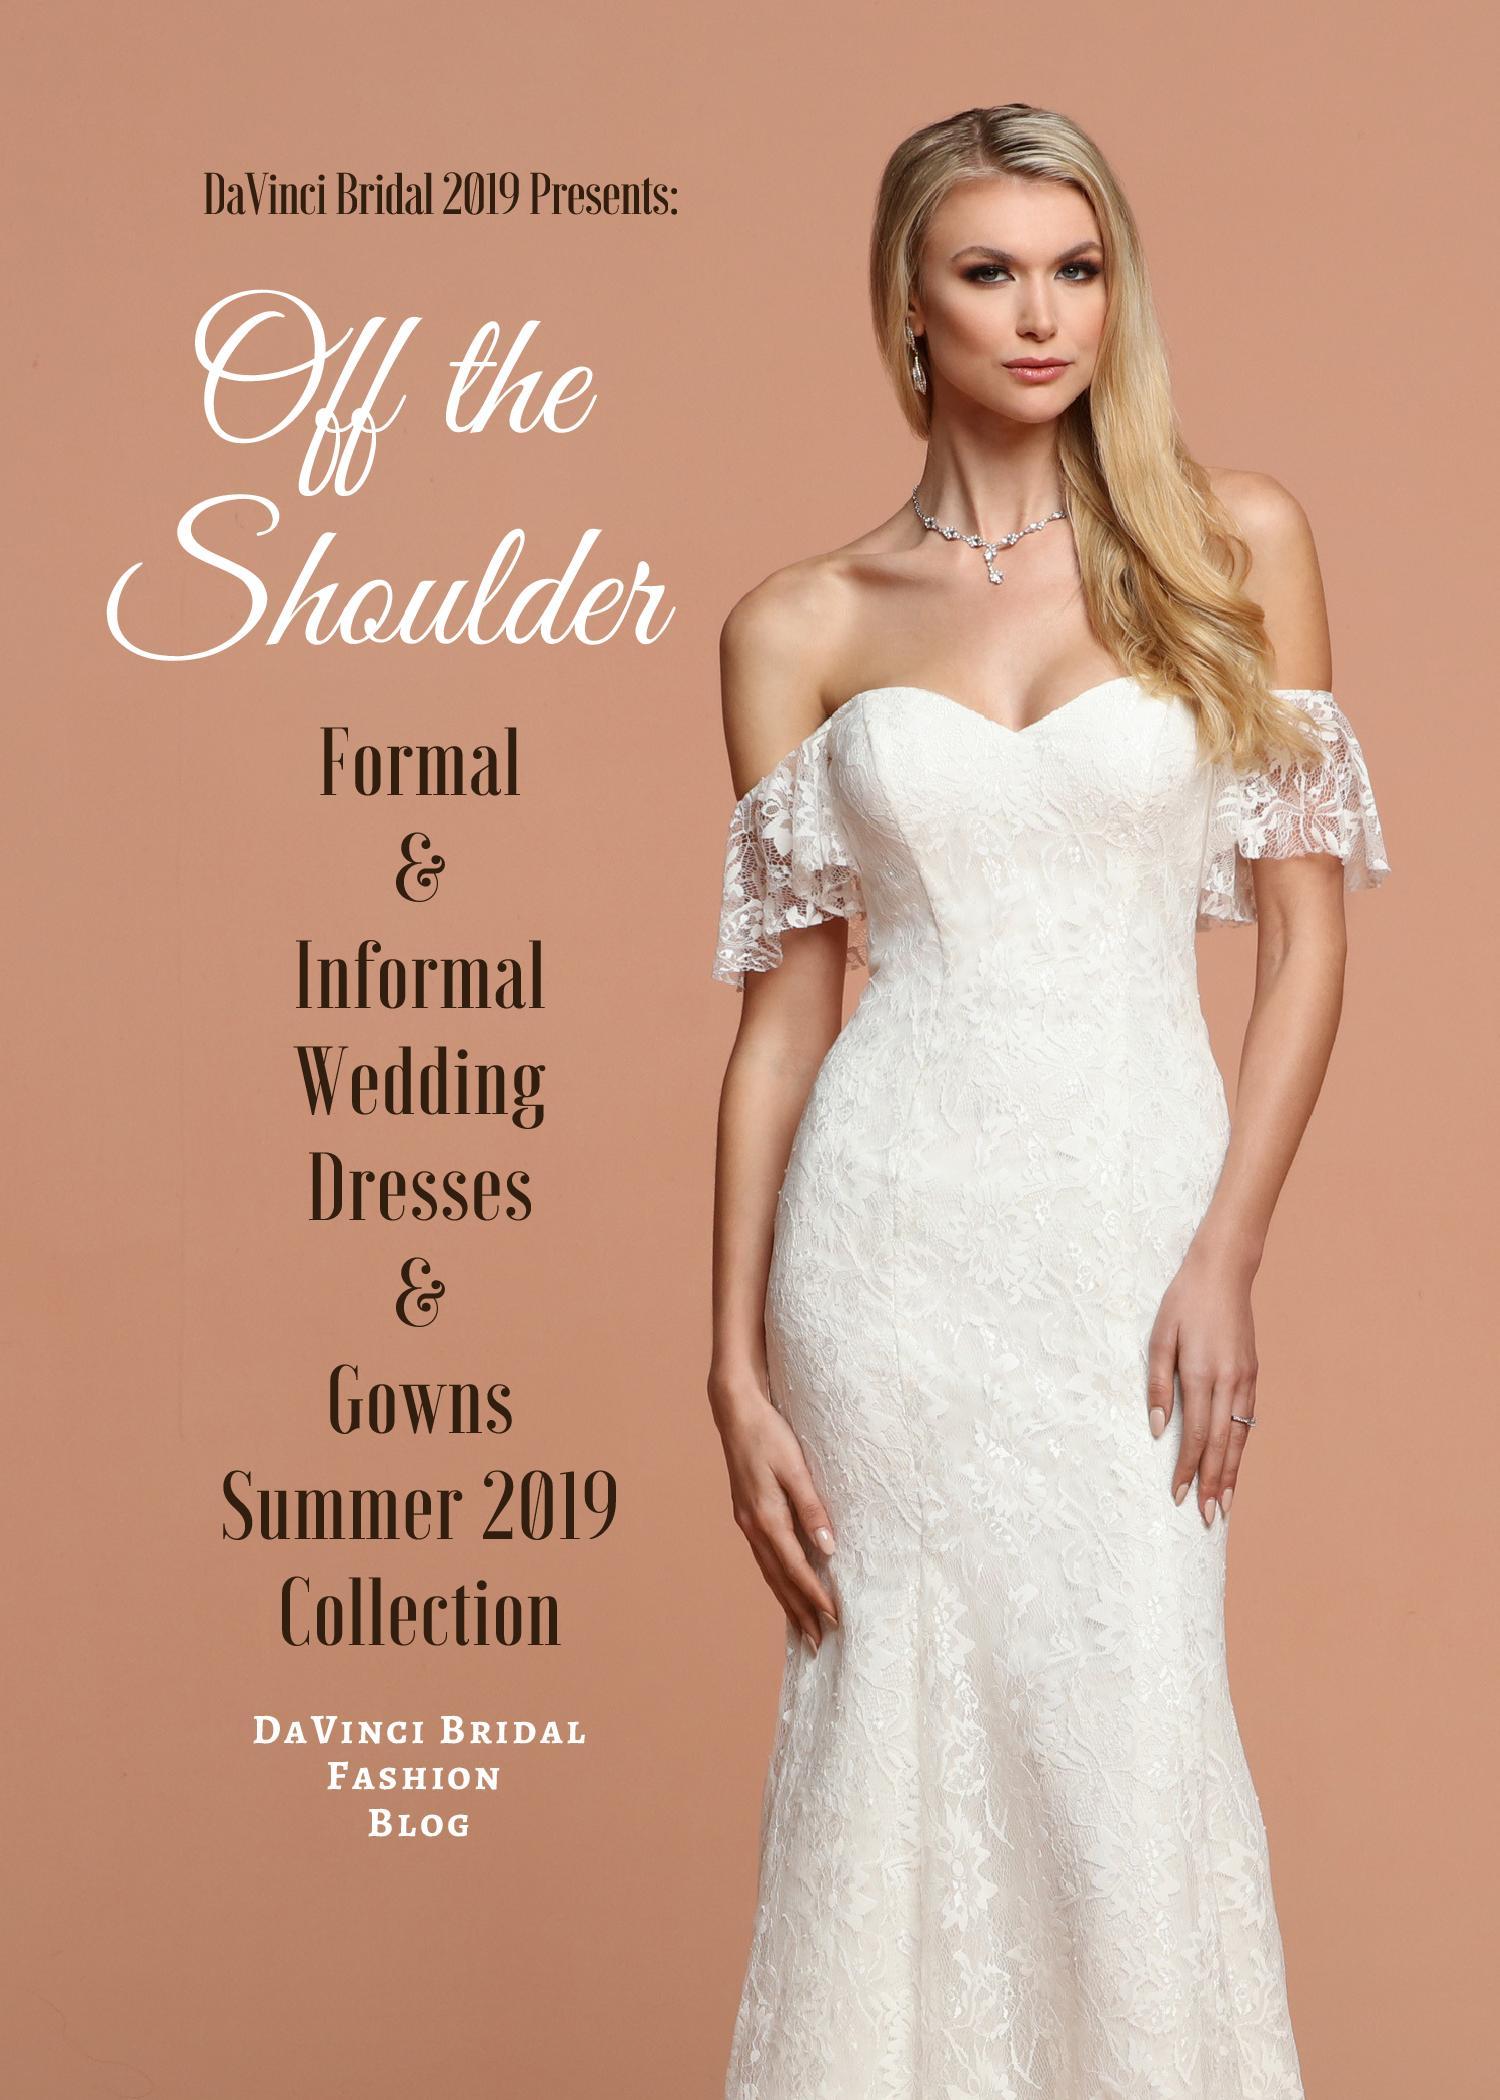 15a04fbdc62ca Off the Shoulder Wedding Dresses & Gowns for 2019 – DaVinci Bridal Fashion  Blog